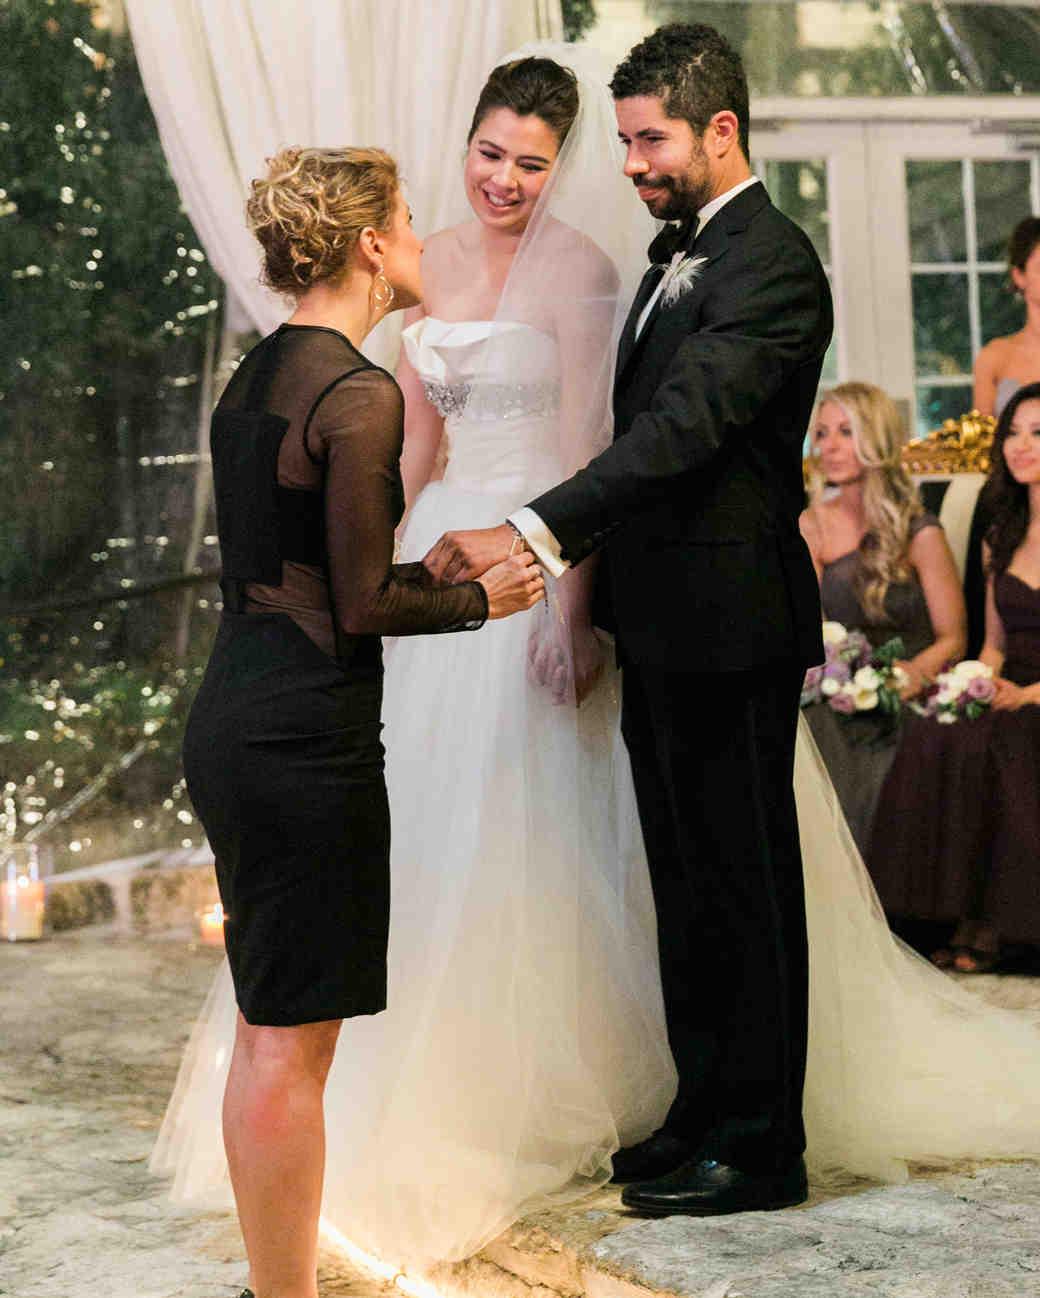 stacey-adam-wedding-ceremony-0083-s112112-0815.jpg